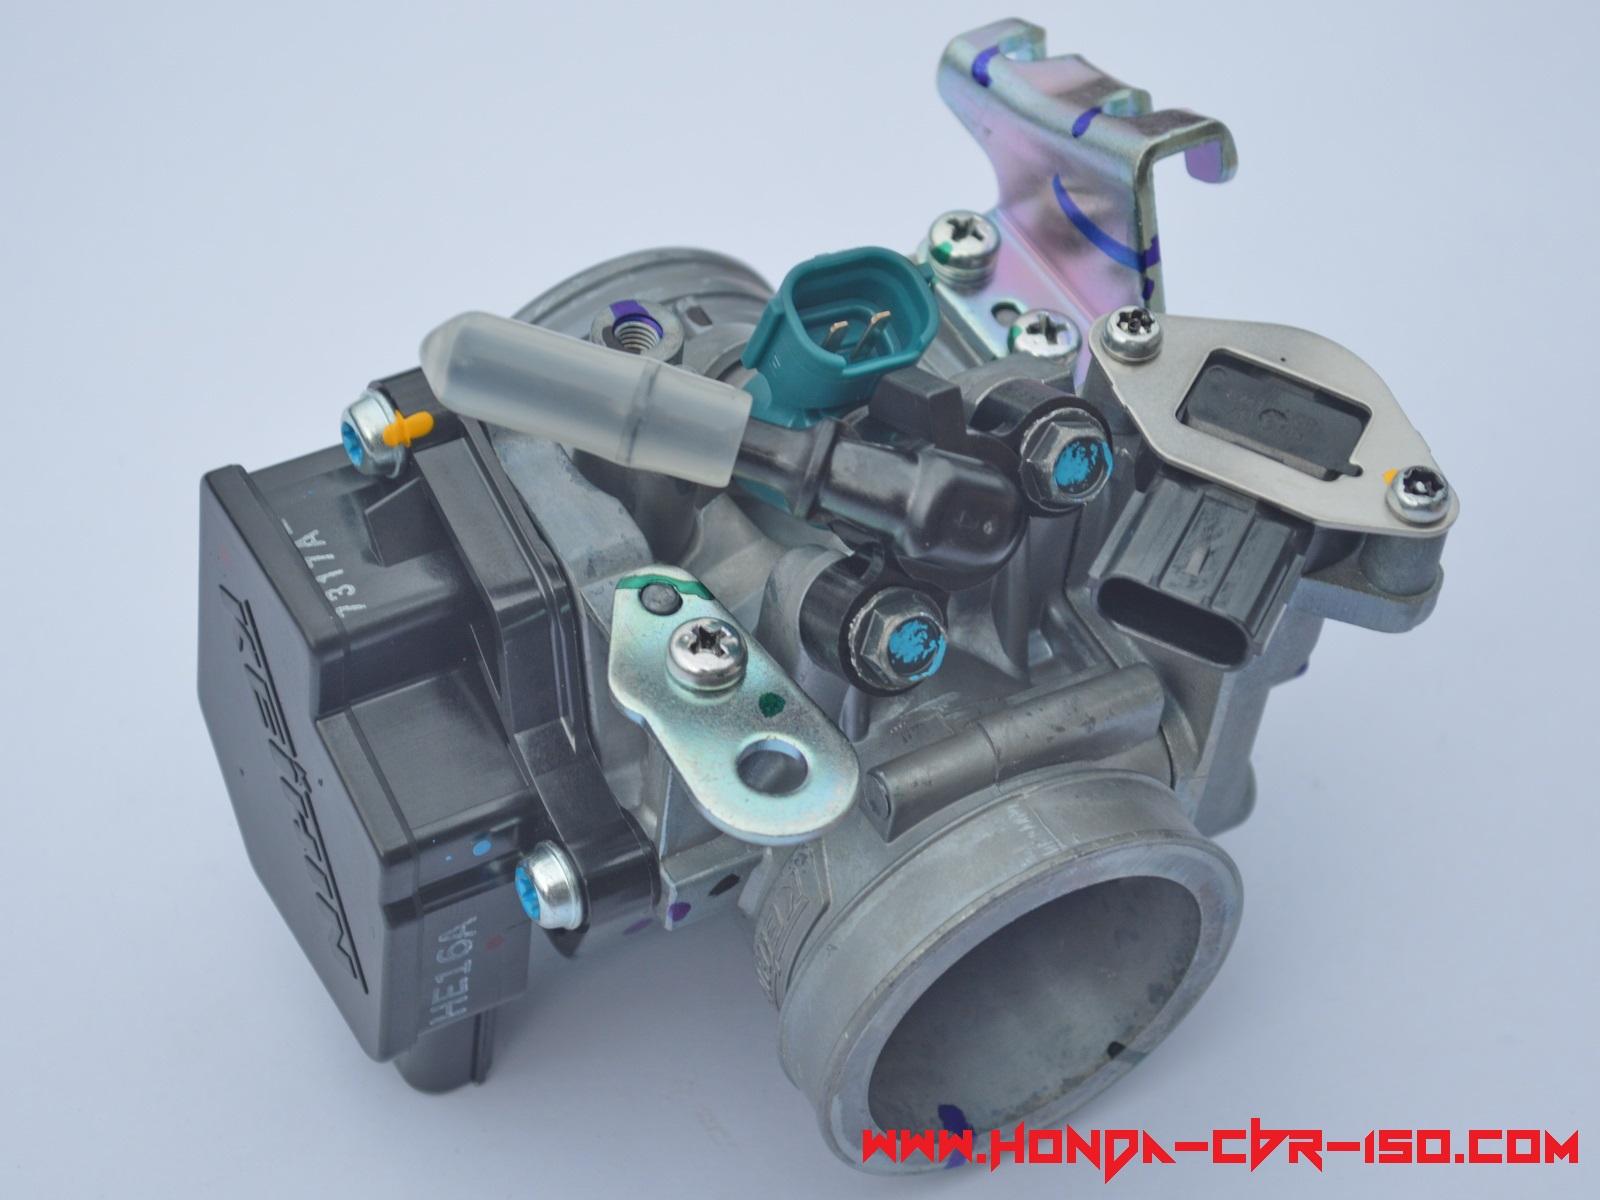 Genuine Honda CBR 150 racing oversize throttle body 30 38 mm